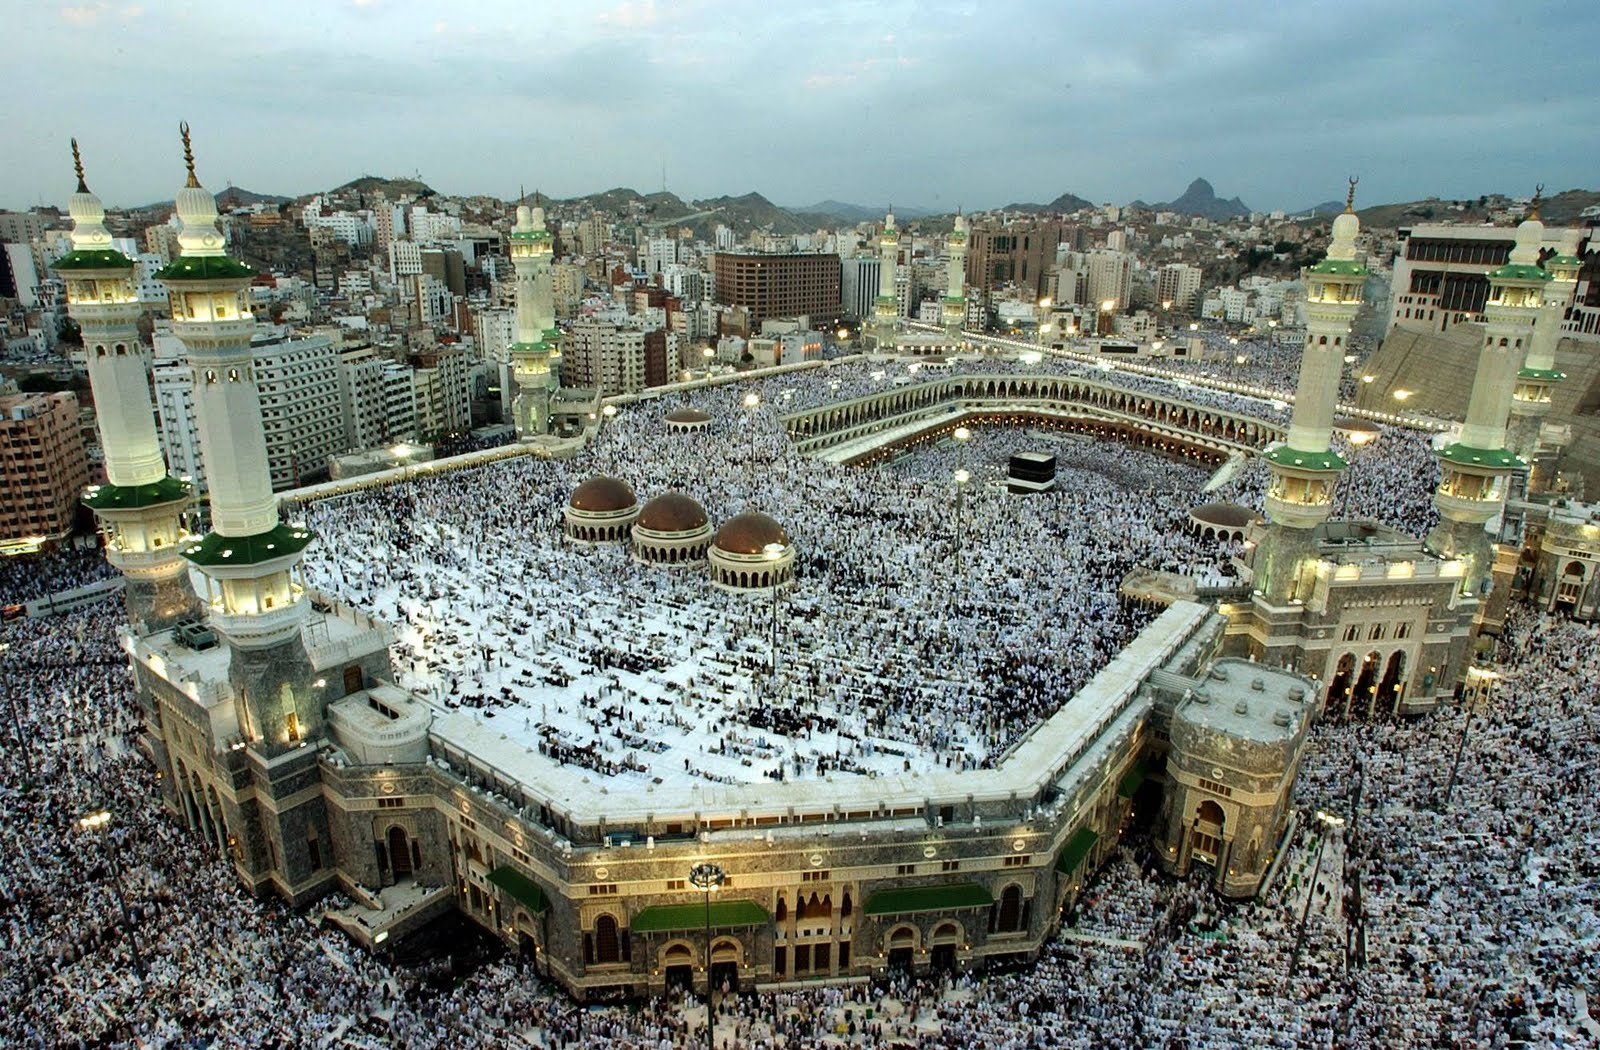 Mecca-SaudiArbia.jpg